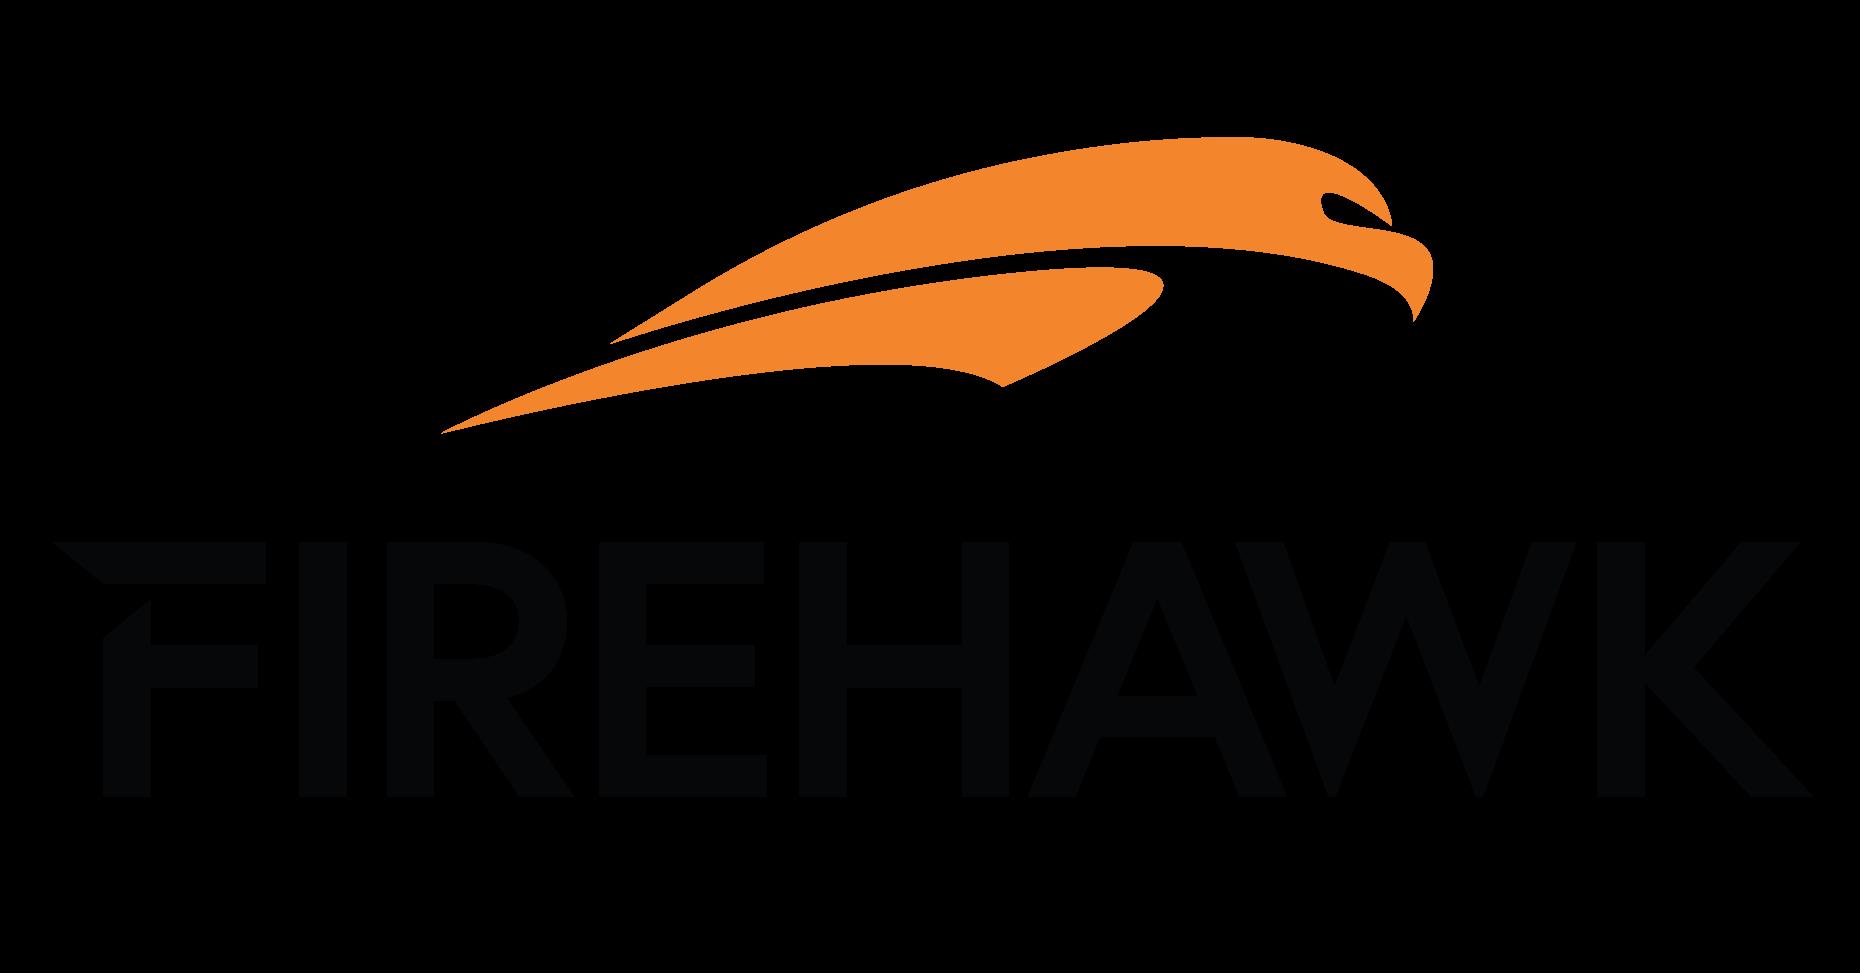 Firehawk Aerospace